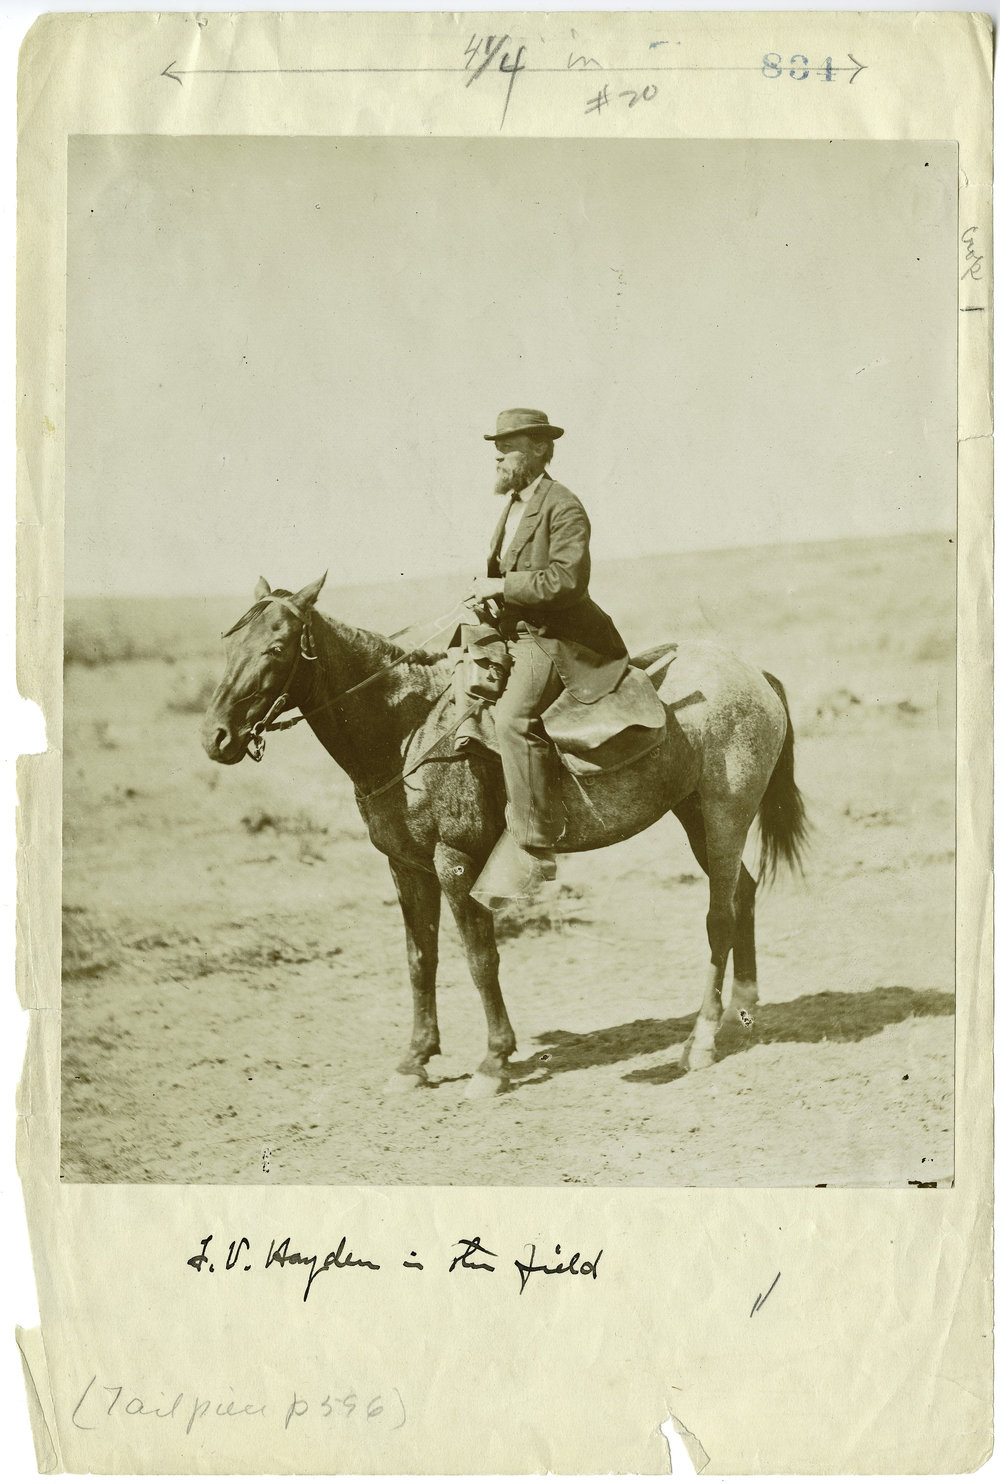 Ferdinand Vandeveer Hayden (1829-1887), the Collection of the Smithsonian Institution Archives